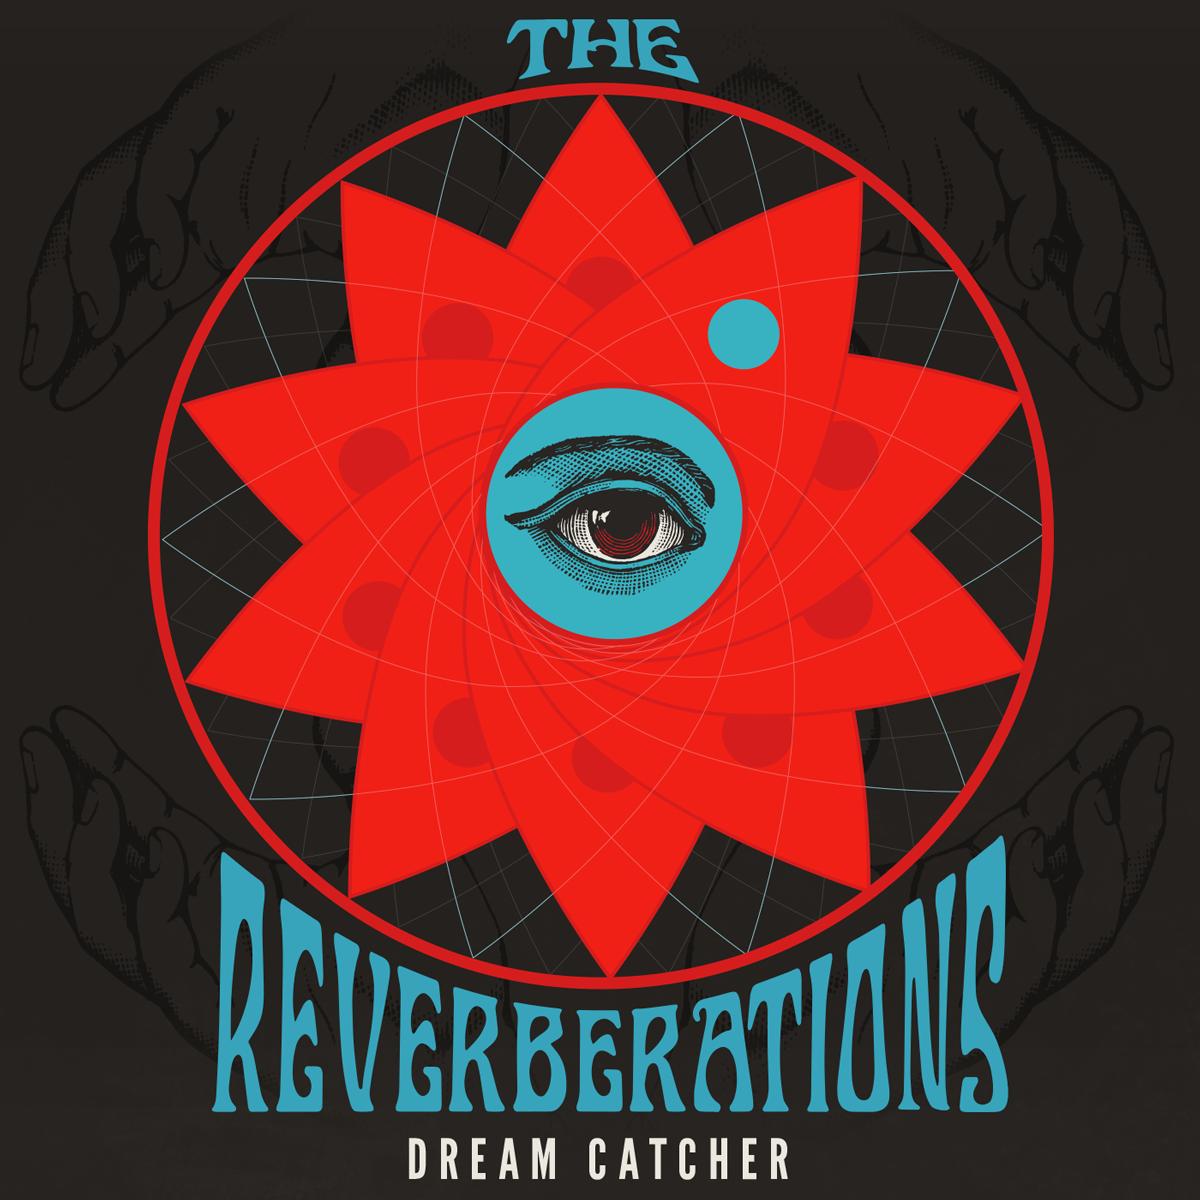 Design for the Dreamcatcher single release